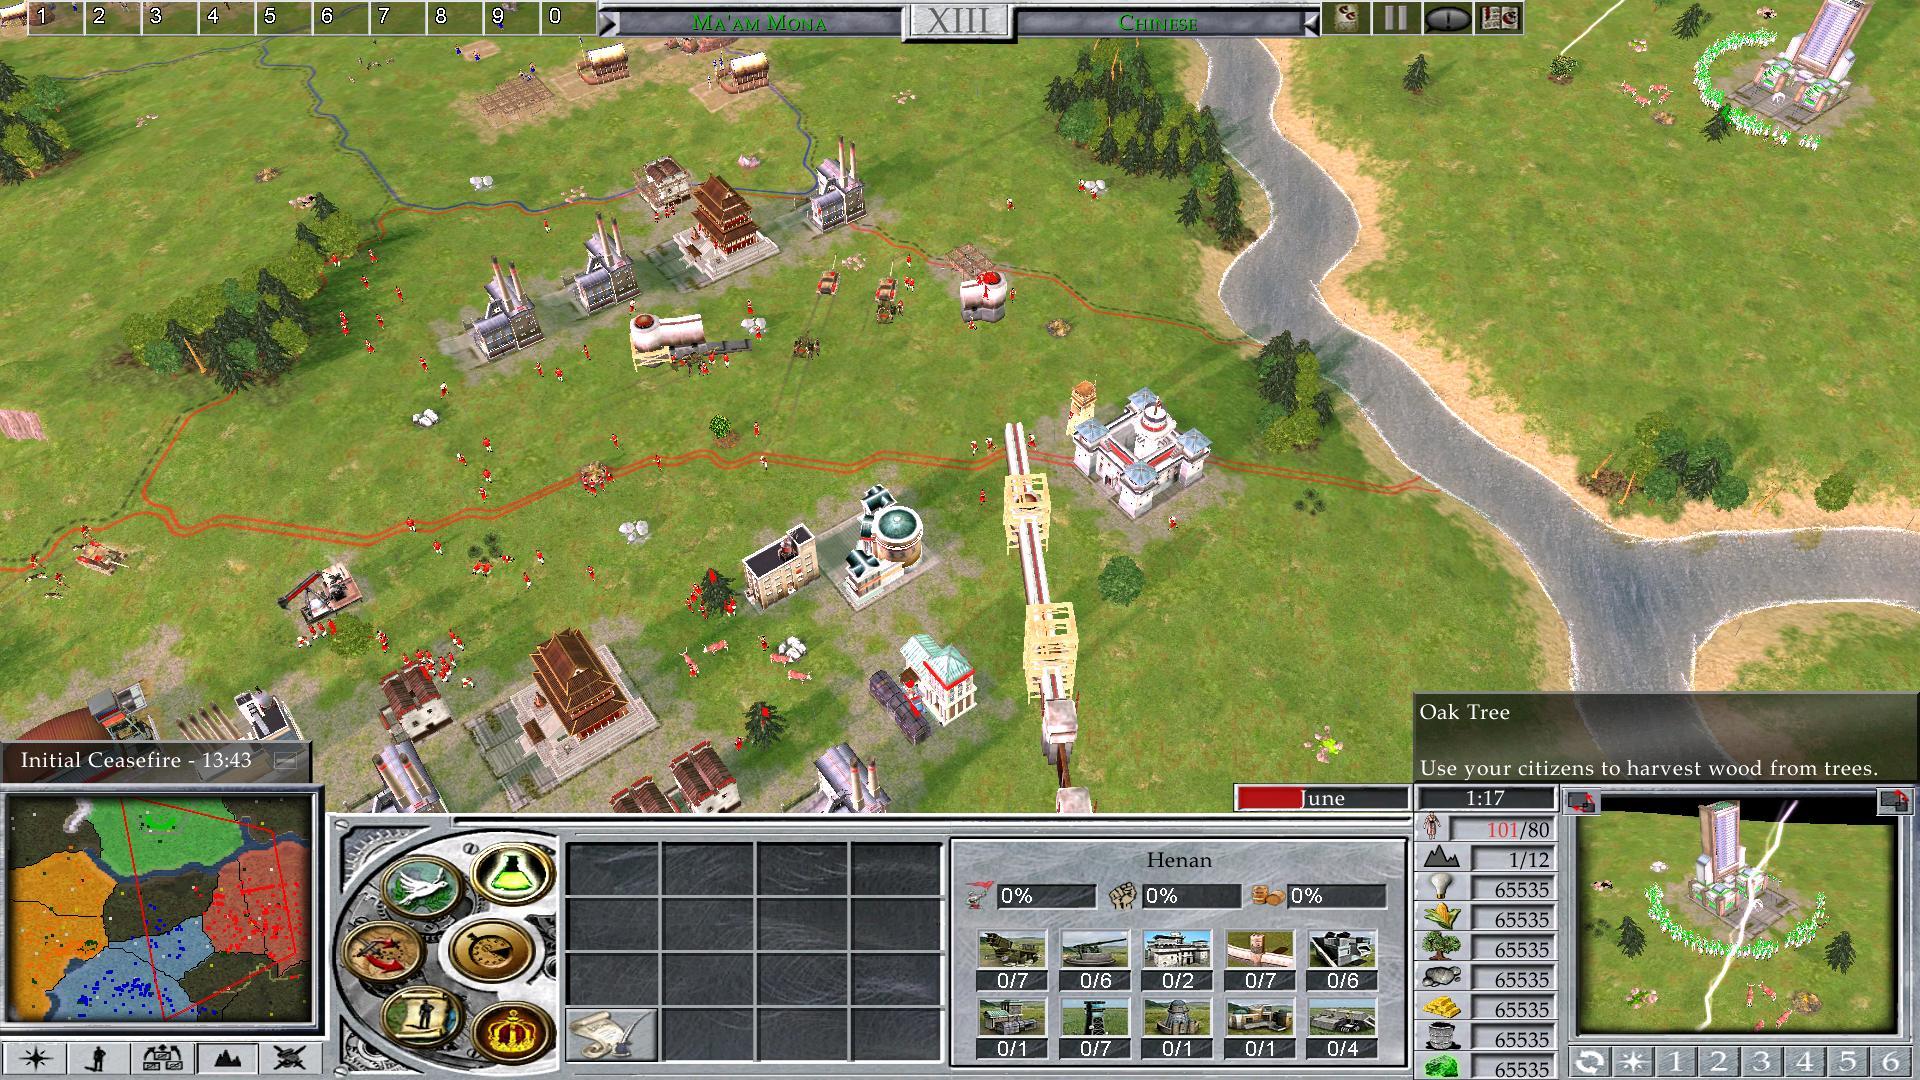 Ee2 ee2x empire earth ii unofficial patch 14 2013 forum2 image image image image image gumiabroncs Images